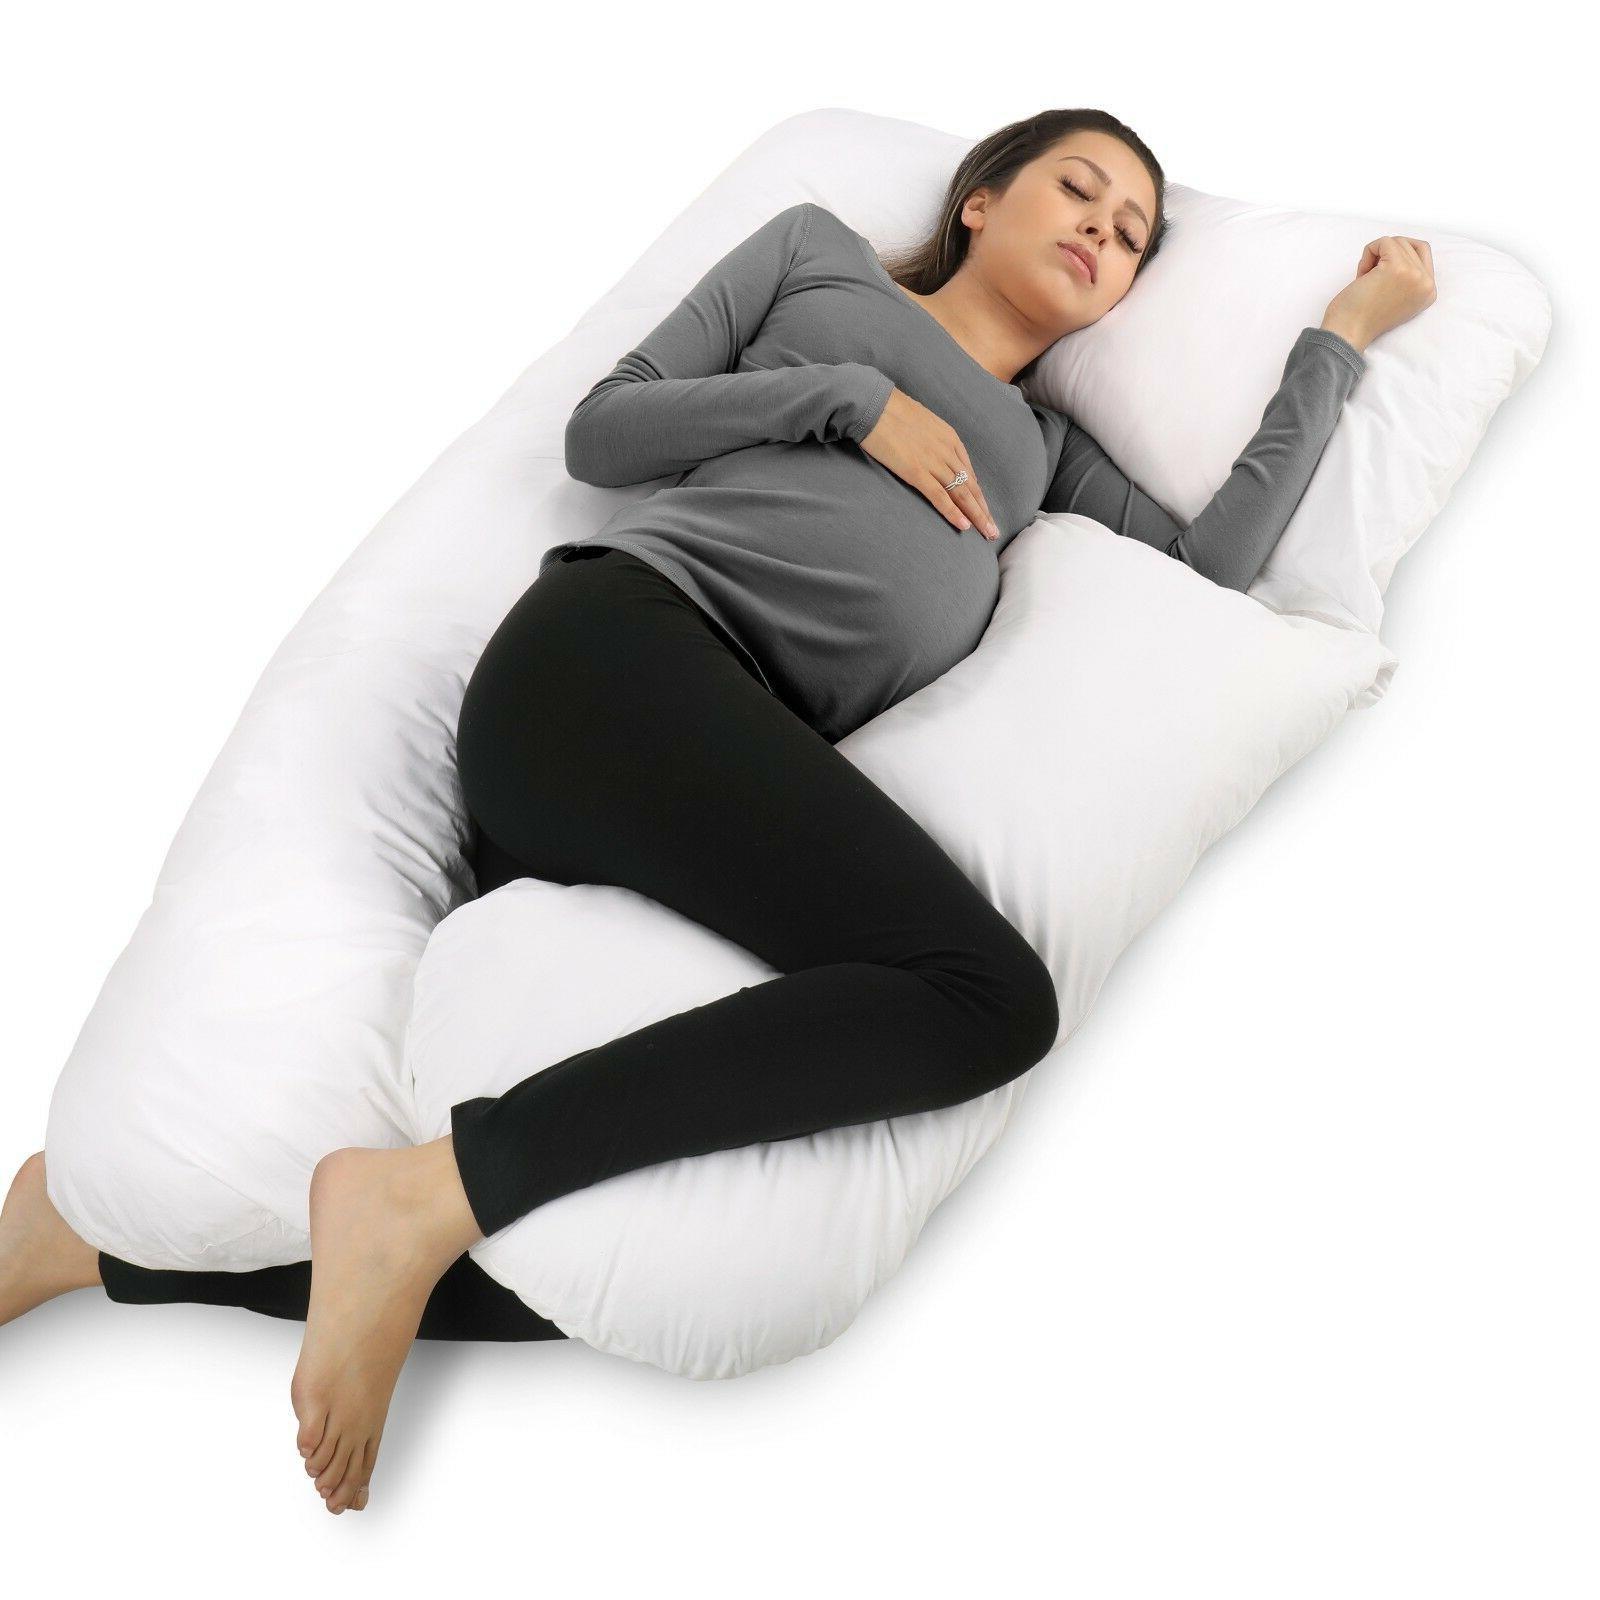 full body pillow u shaped pregnancy pillow